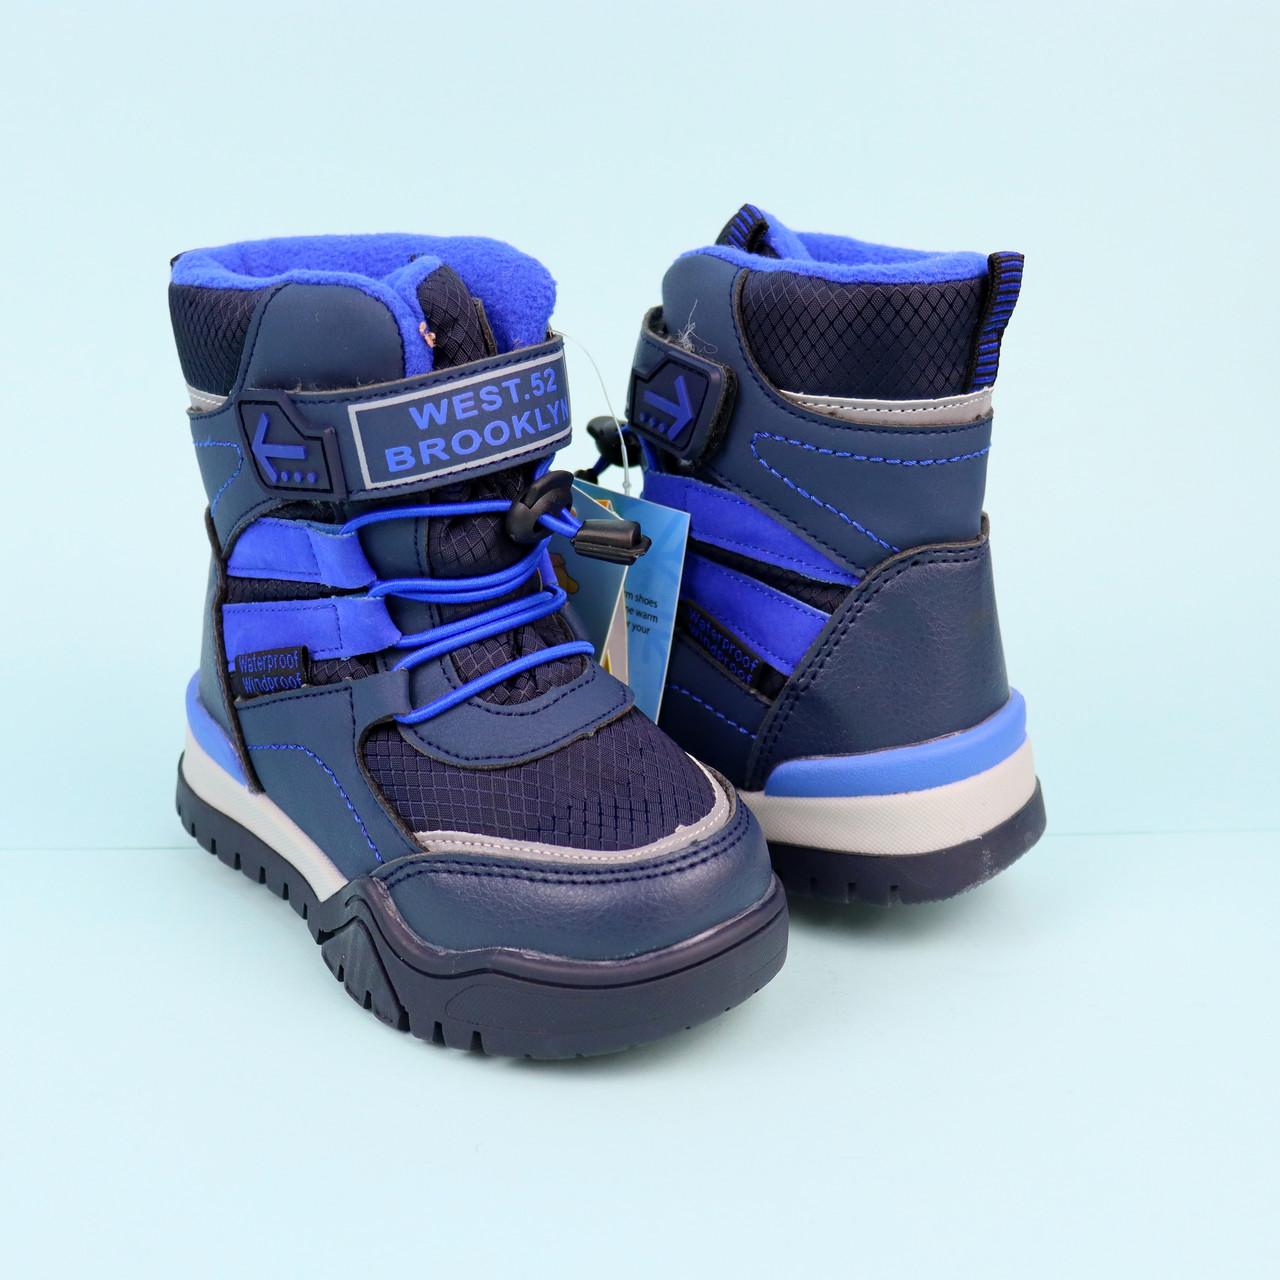 7672С Термо ботинки для мальчика на липучках тм Том.м размер 23,25